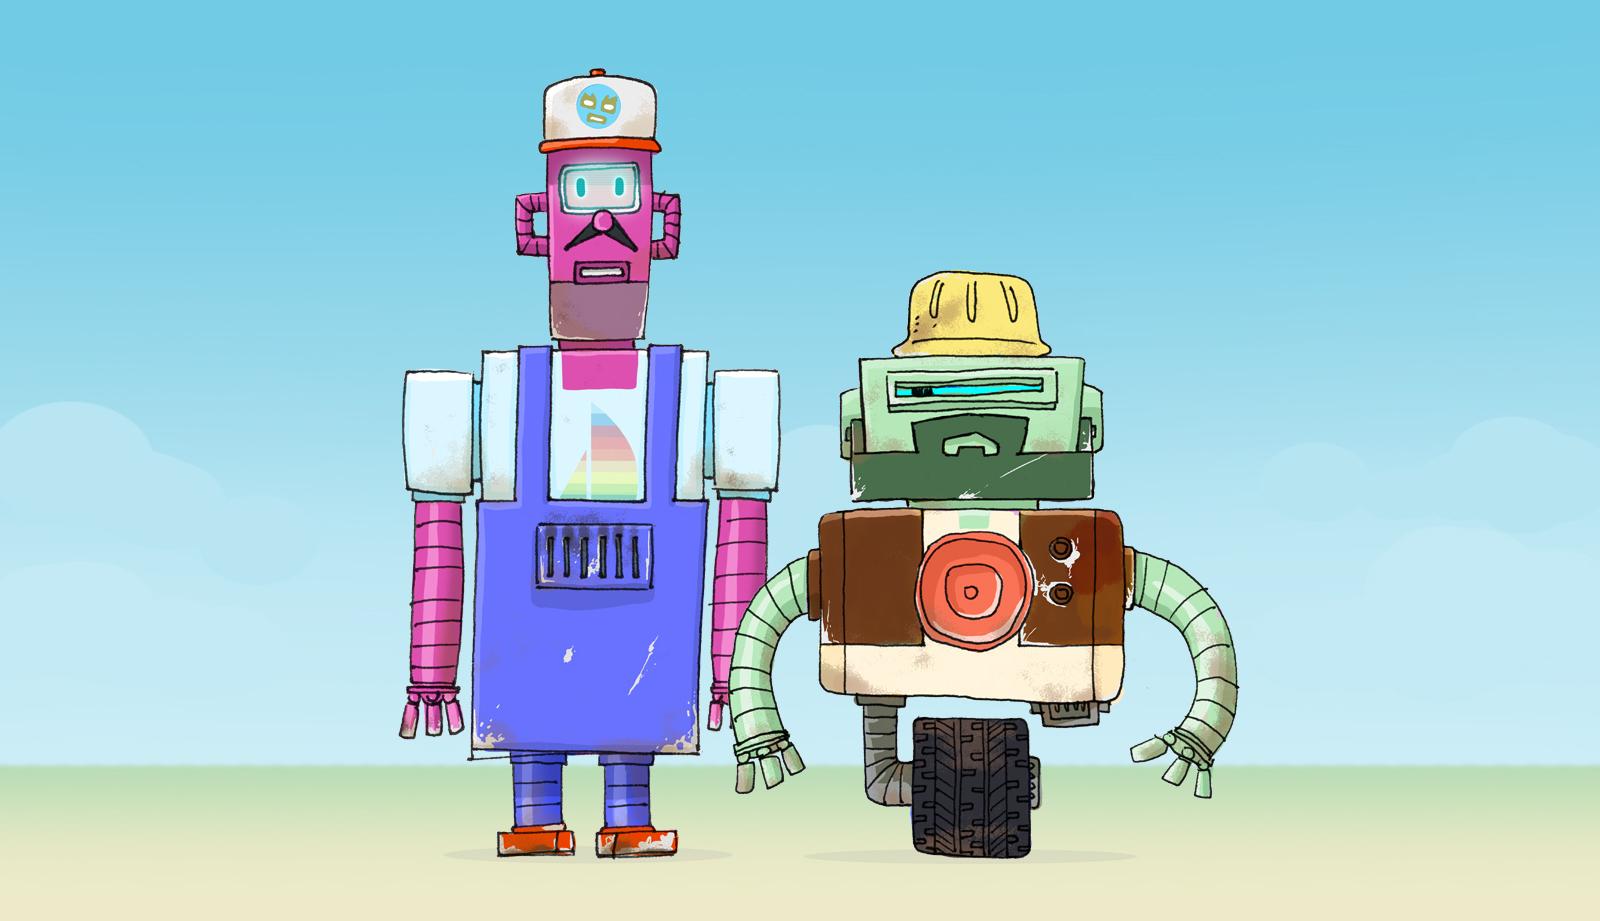 robo-01.jpg